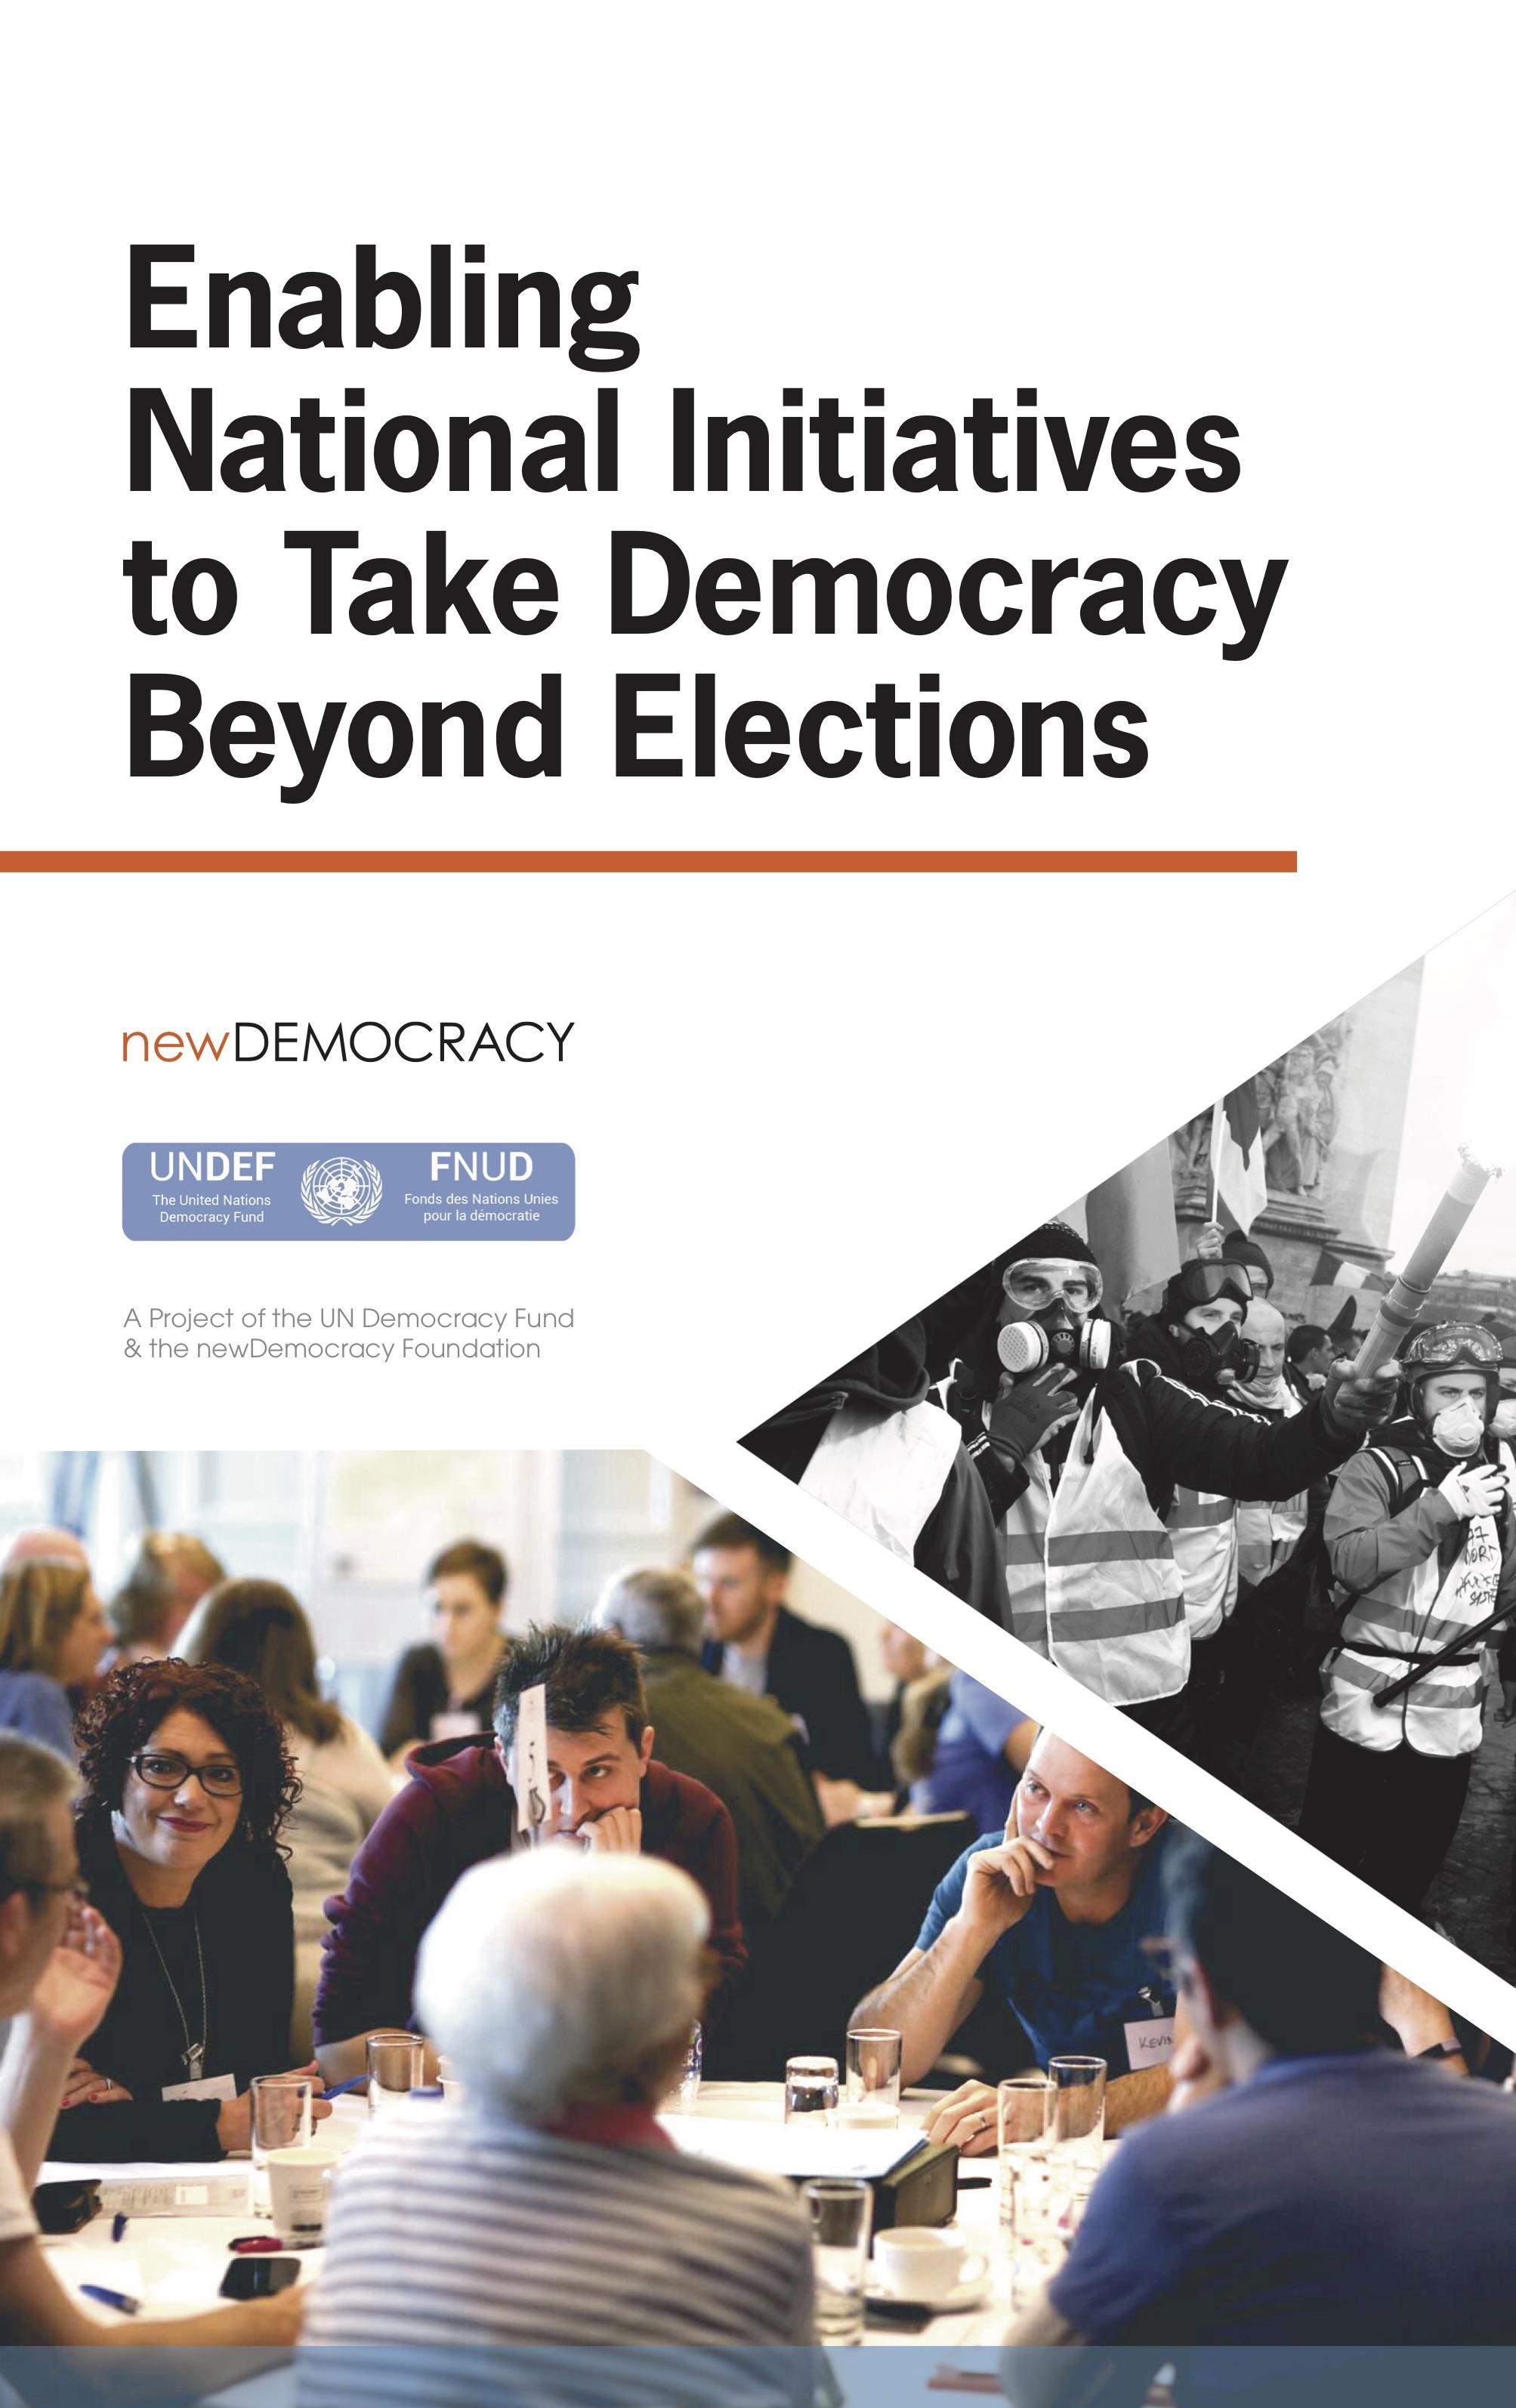 New-Democracy-Handbook-FINAL-LAYOUT-reduced.jpg